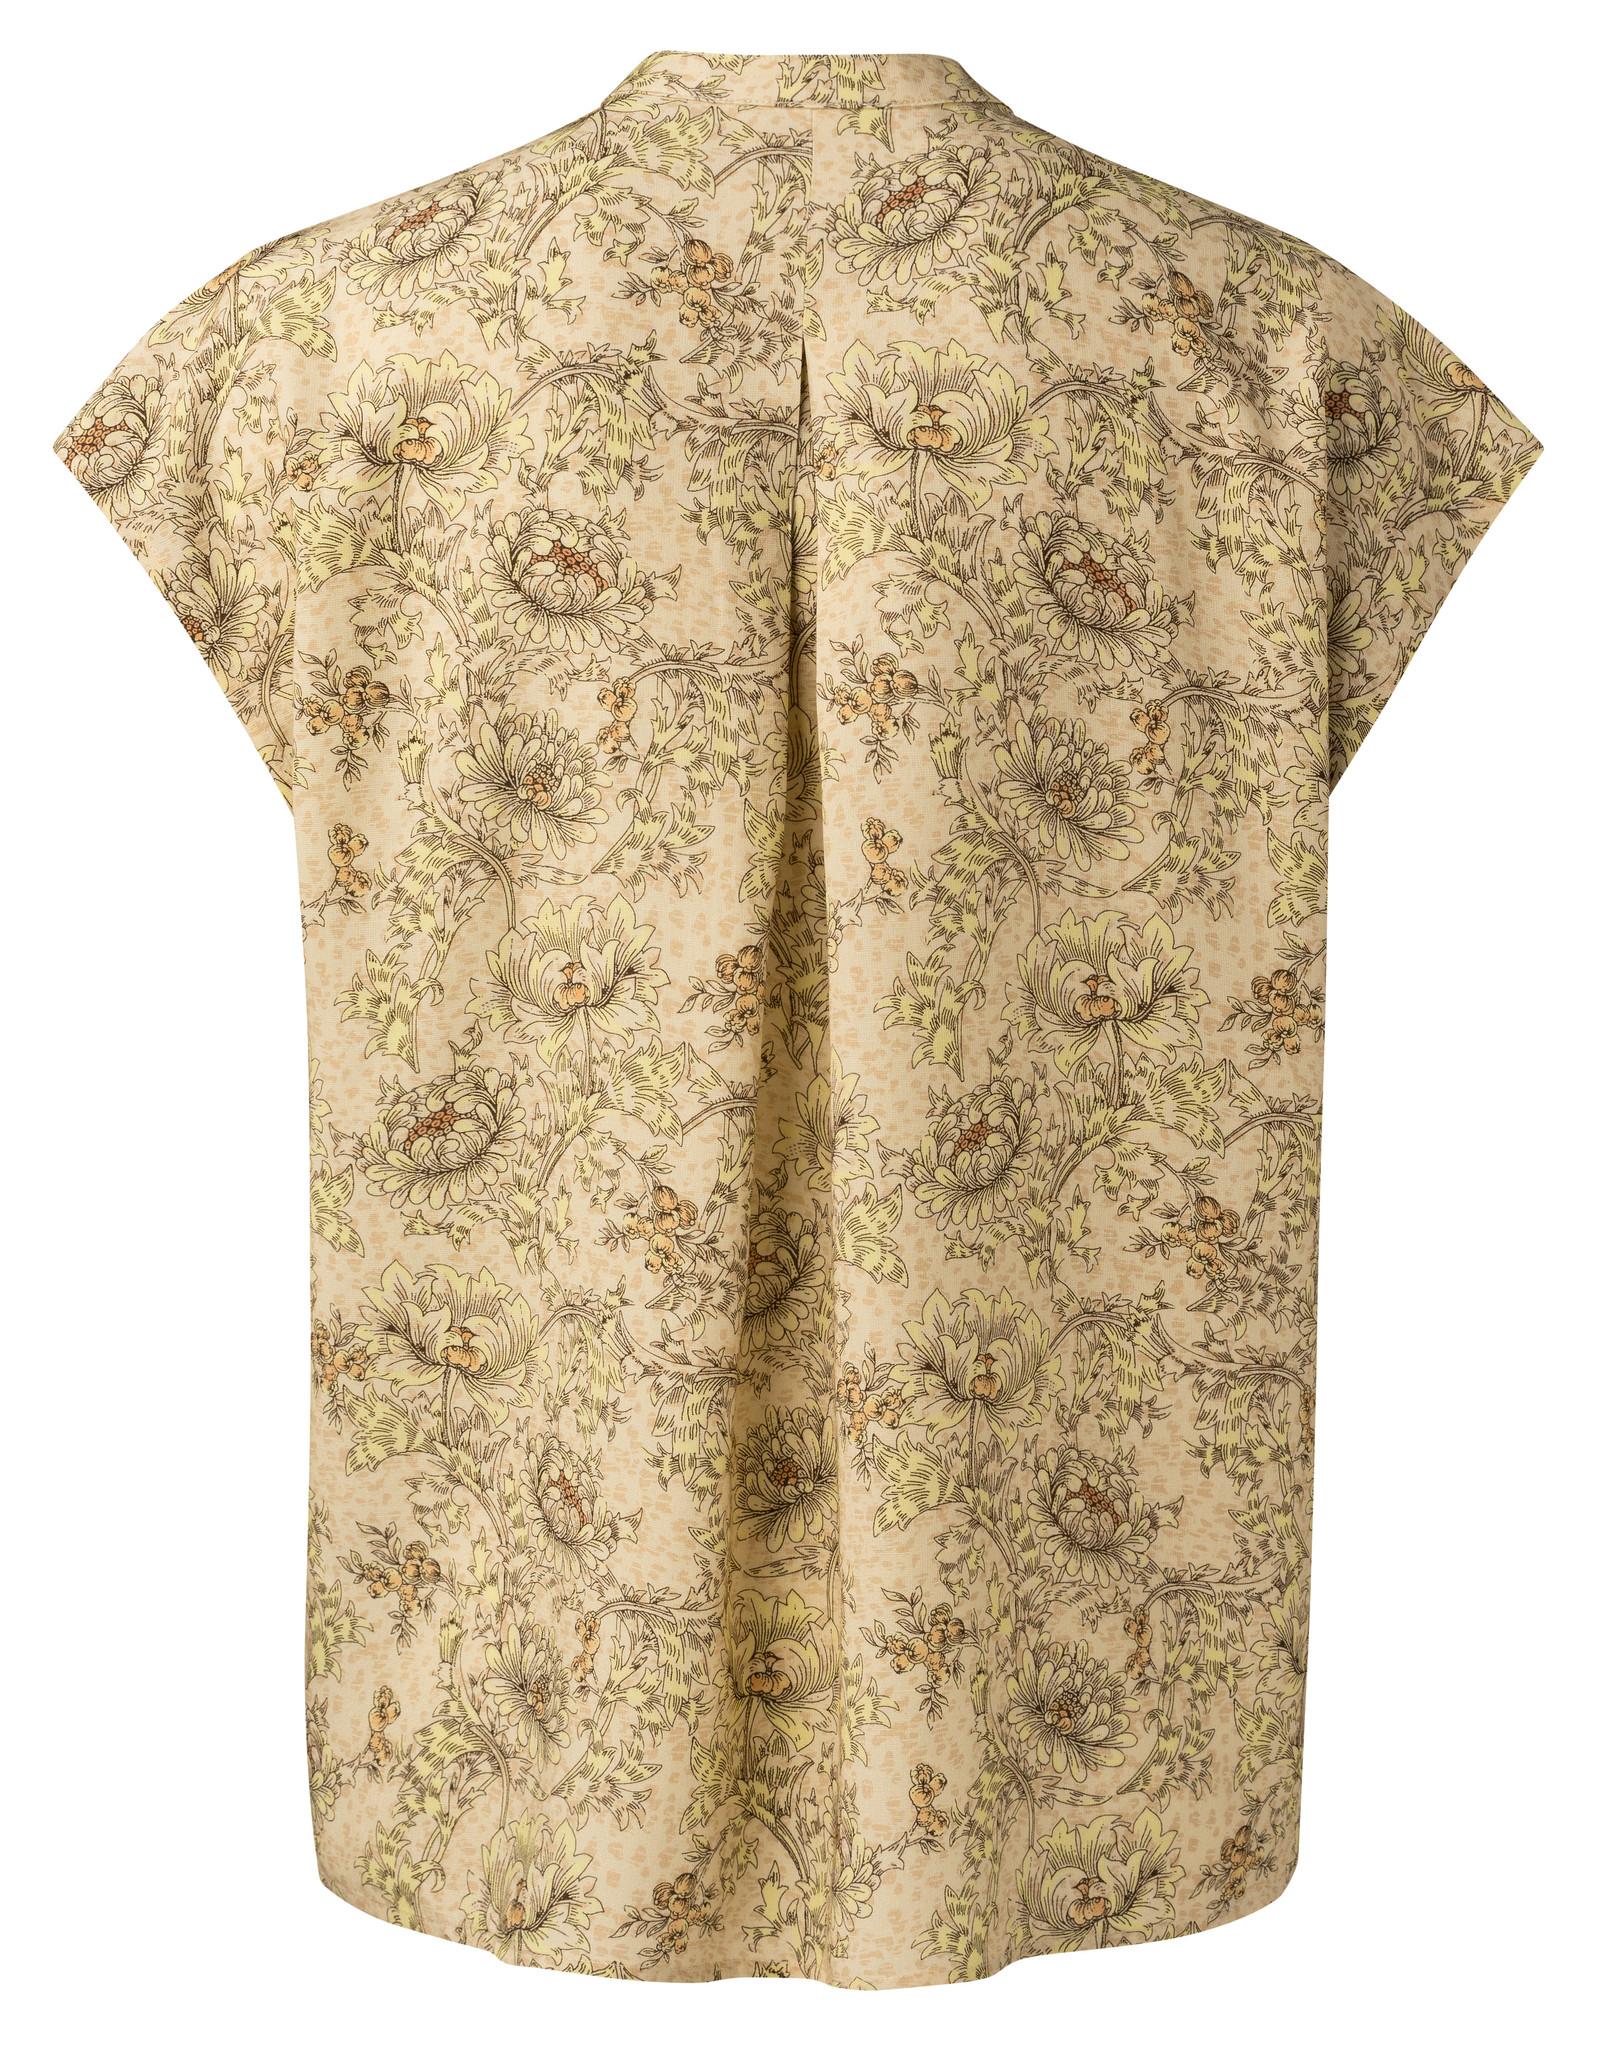 yaya Printed v-neck top 1901437-115-3